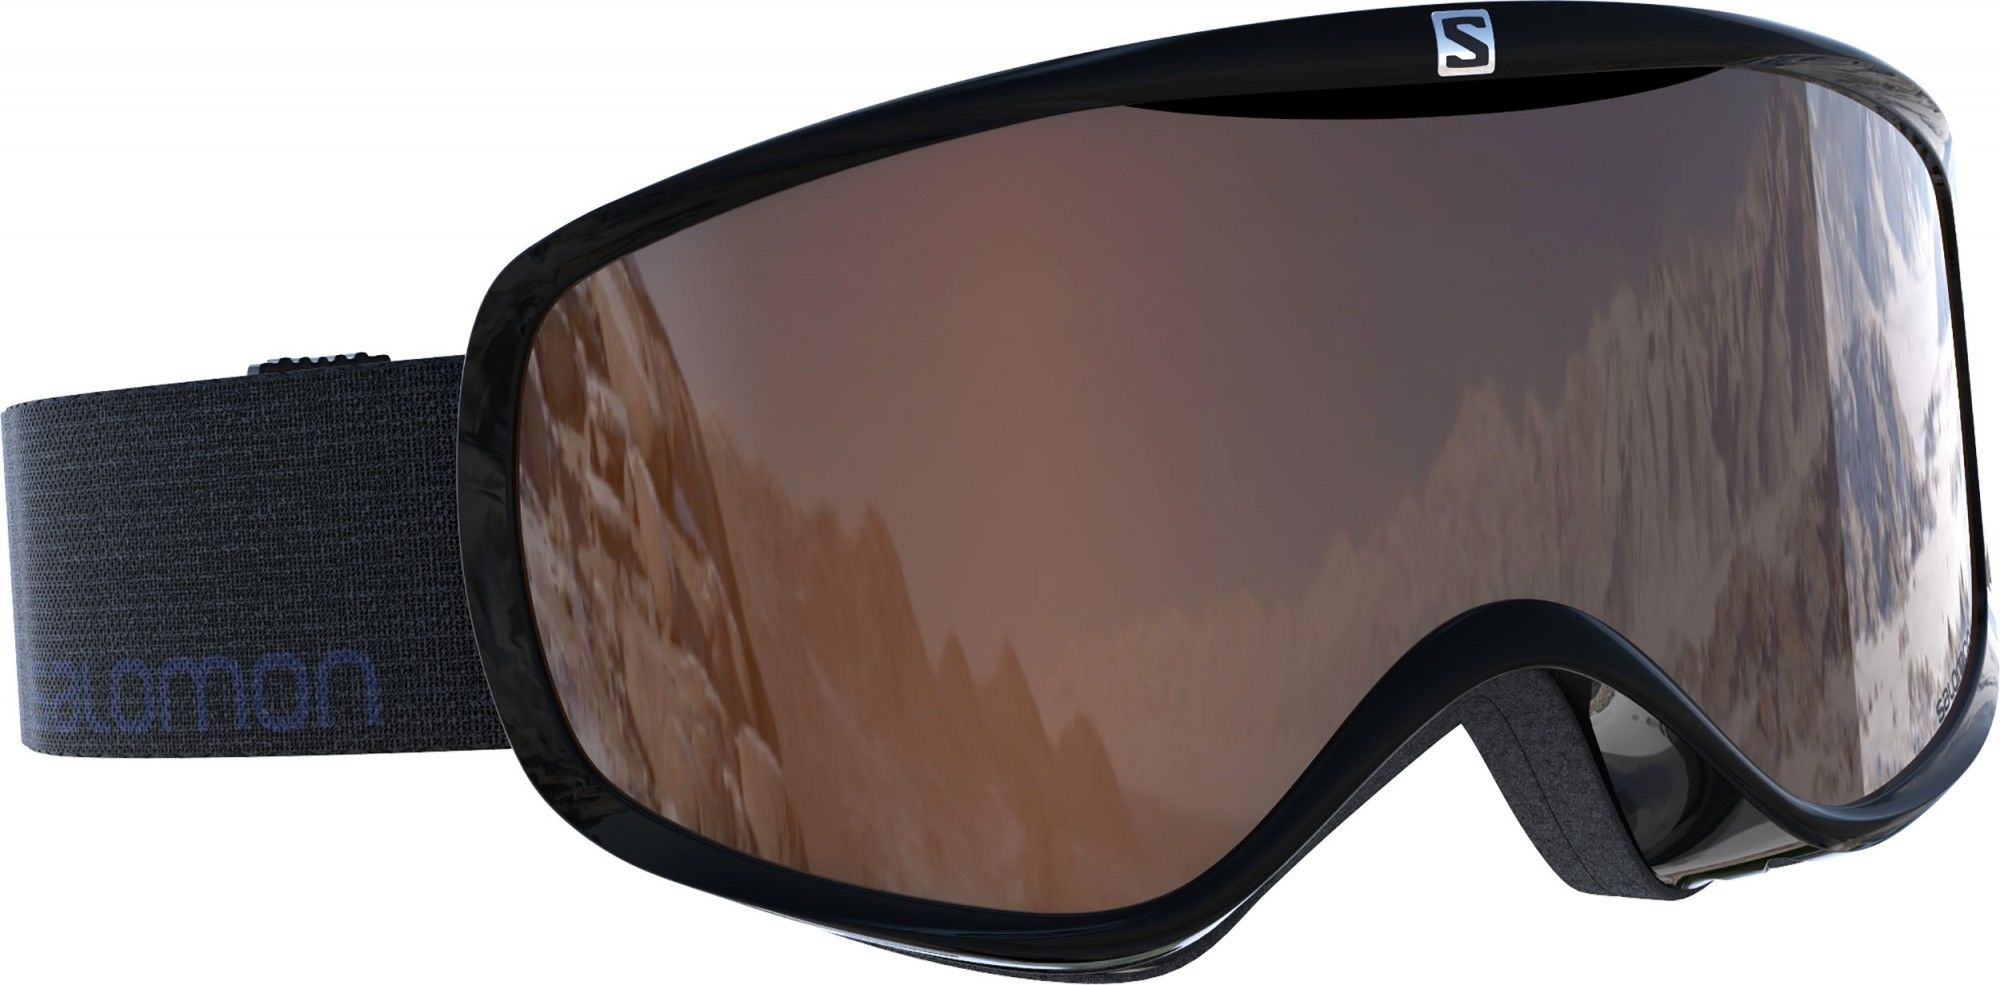 Salomon W Sense Access | Größe One Size | Damen Skibrille